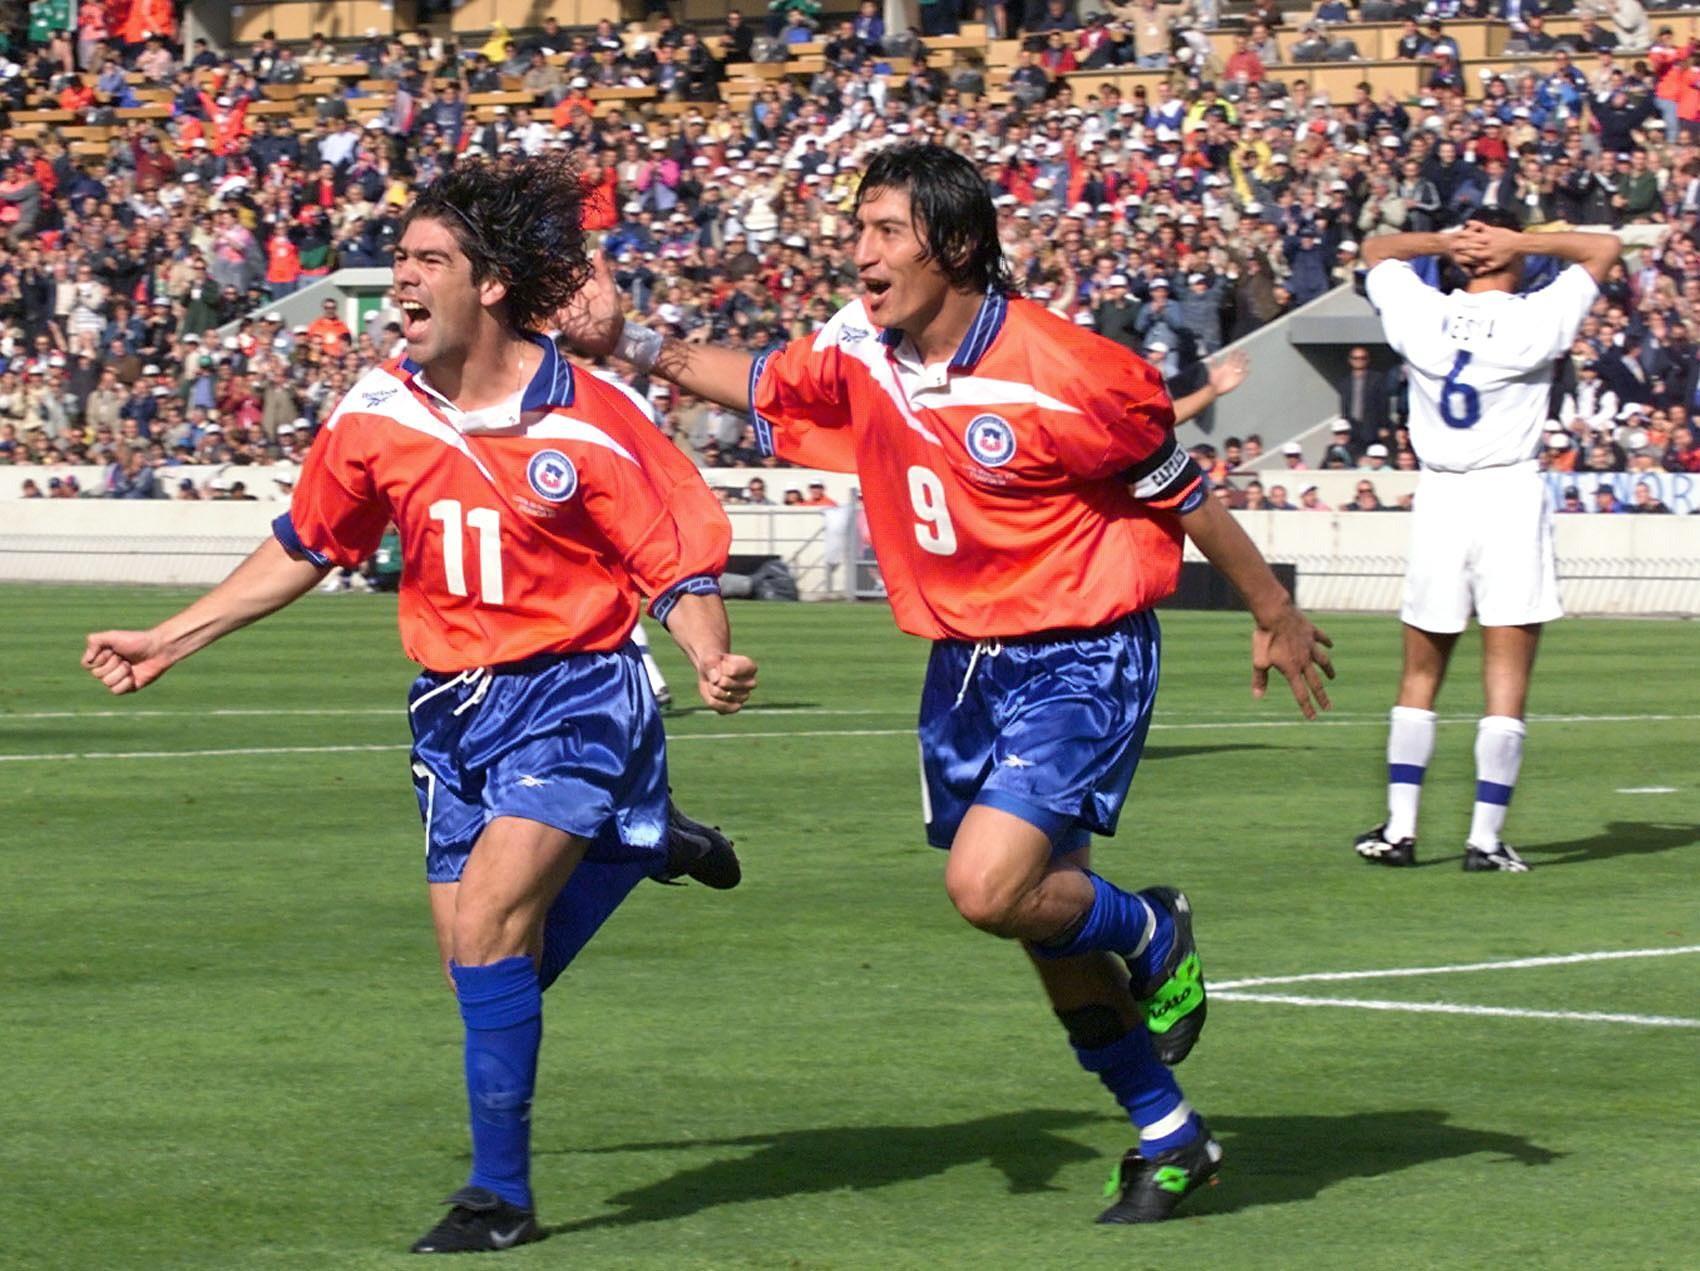 Zamorano & Salas 1998 vs Italy   Winning shirts, American football, Football playoffs